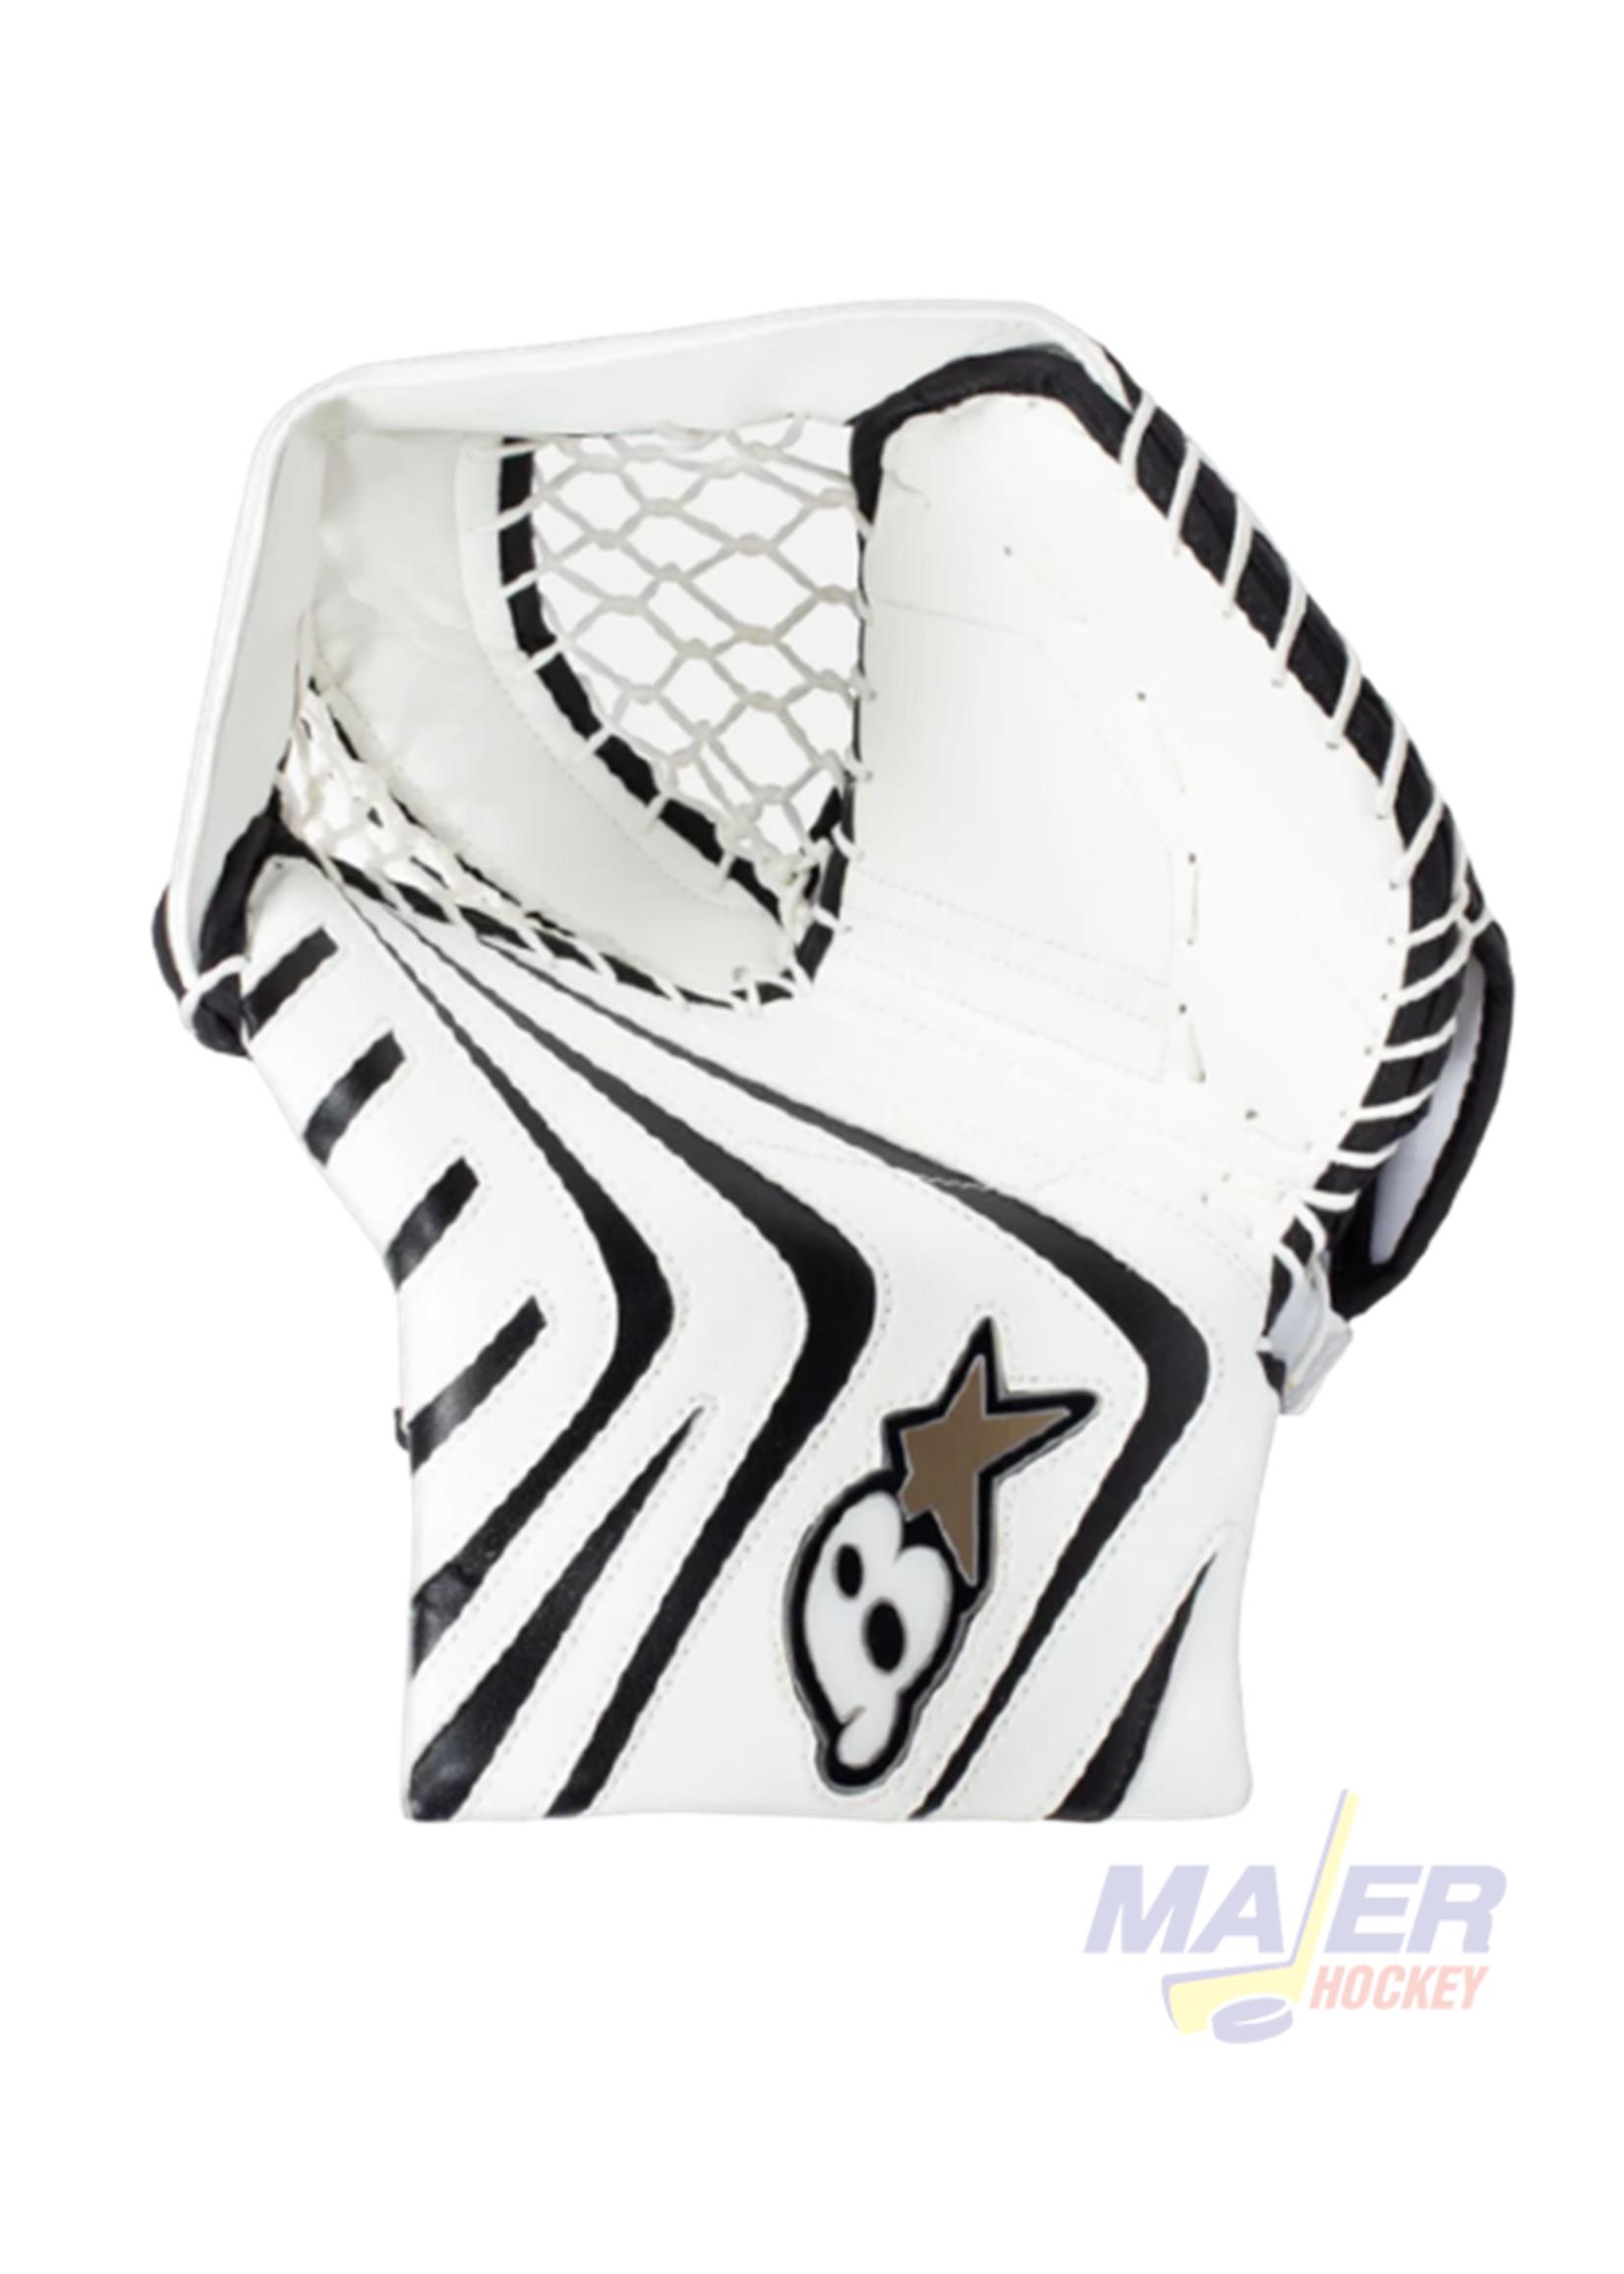 Brian's Optik 9.0 Junior Goalie Glove